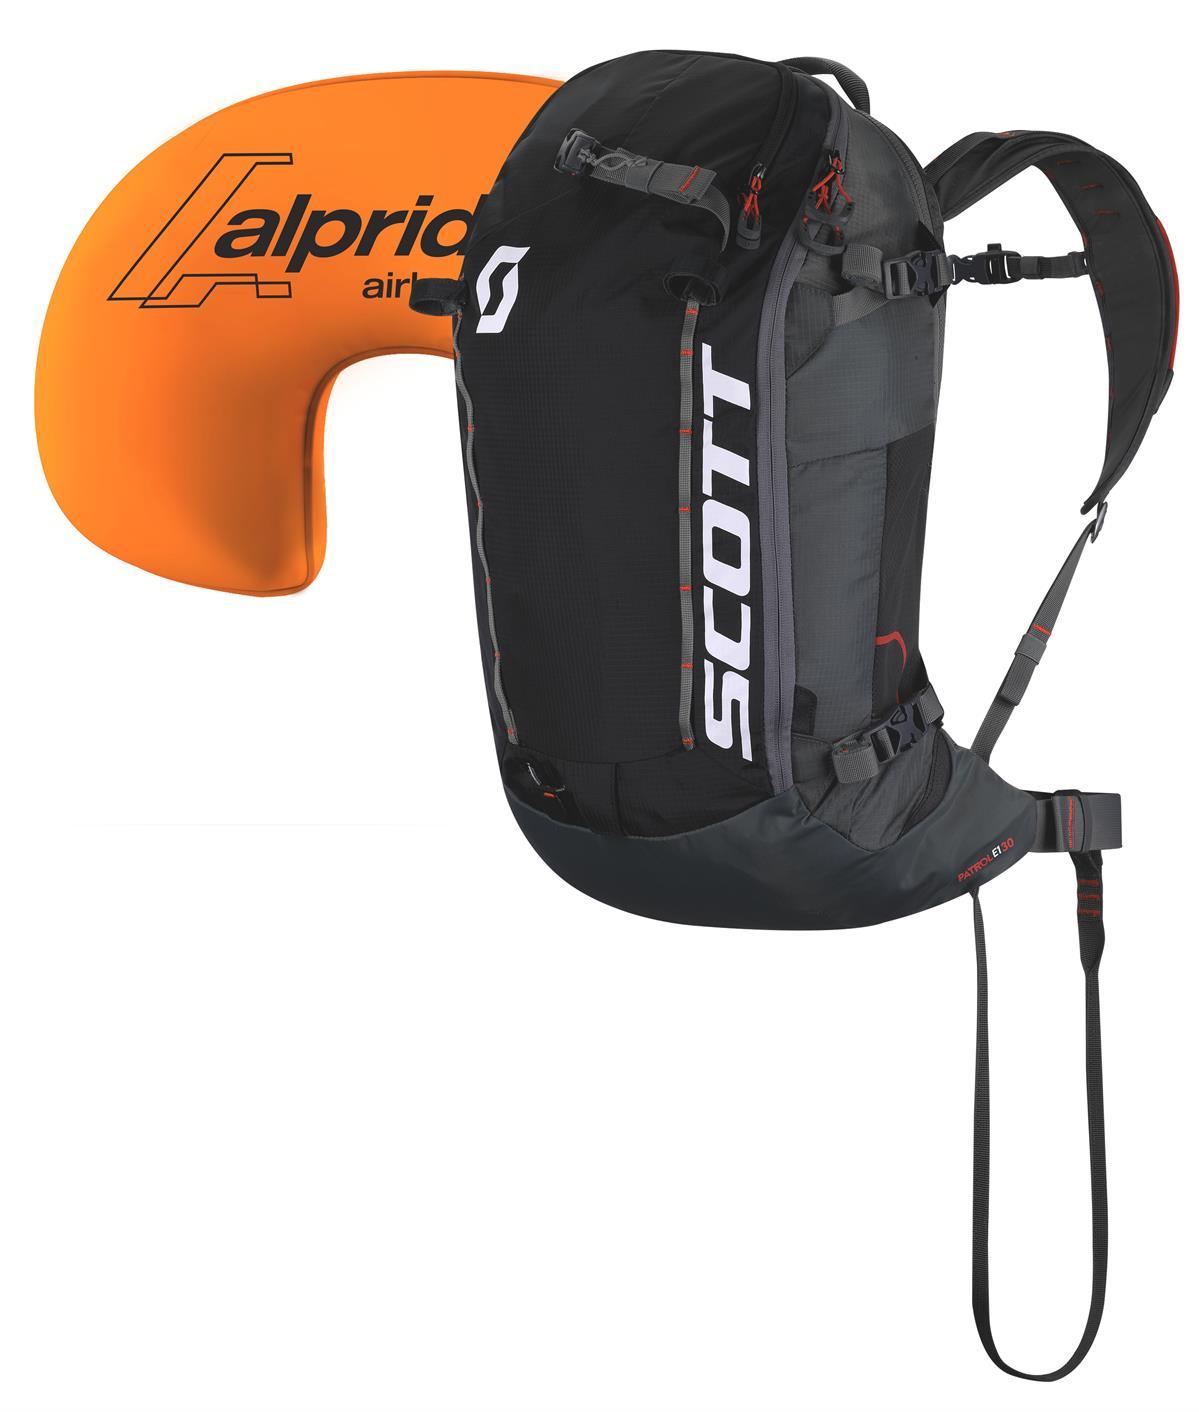 scott-patrol-alpride-e1-30l-avalanche-kit-backpack_ black.jpg